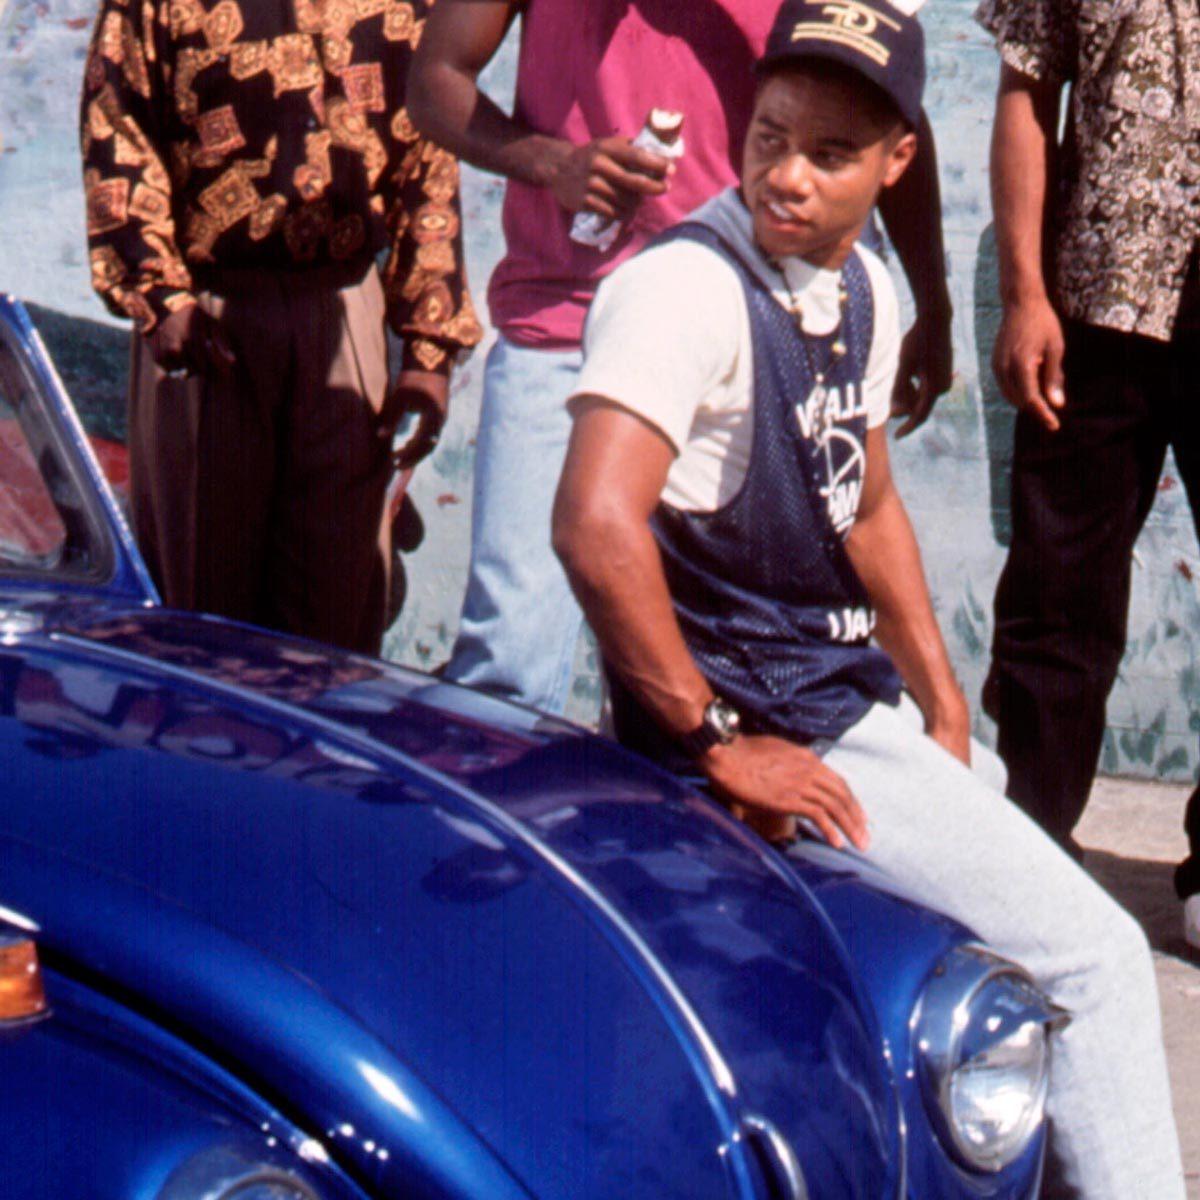 Cuba Gooding Jr blue VW bug from Boyz N the Hood